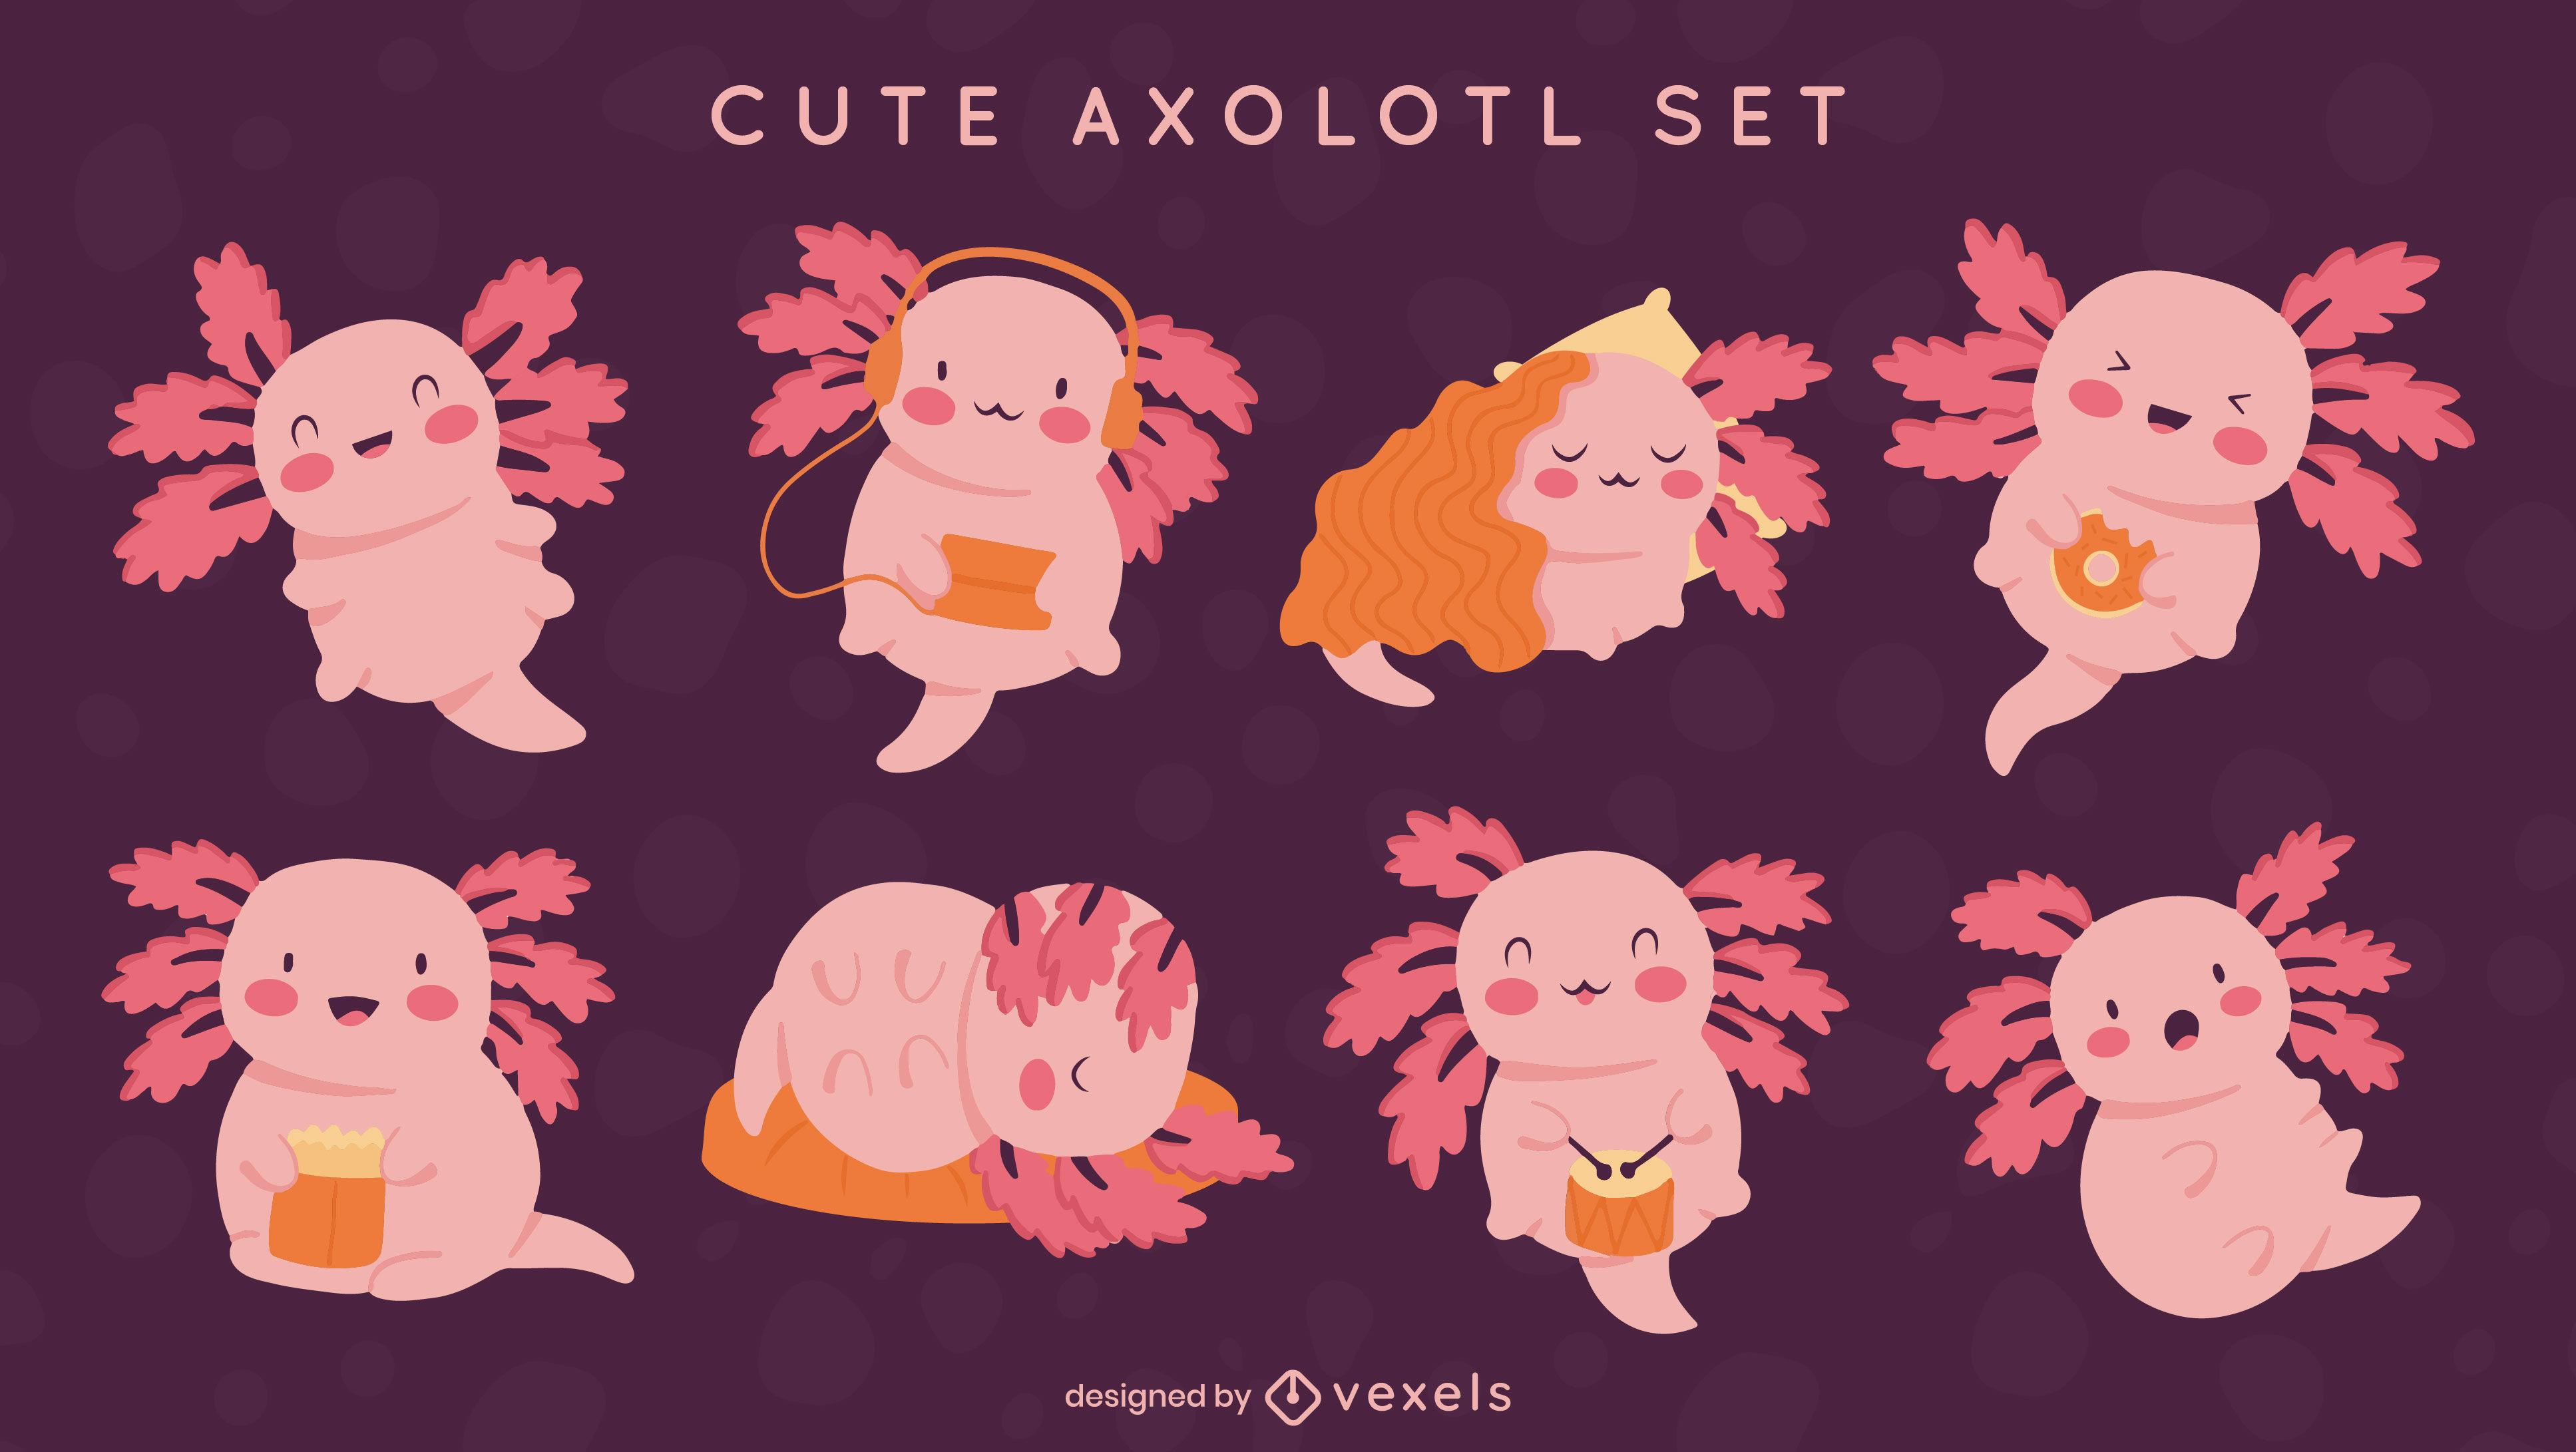 Adorable axolotl animal character set